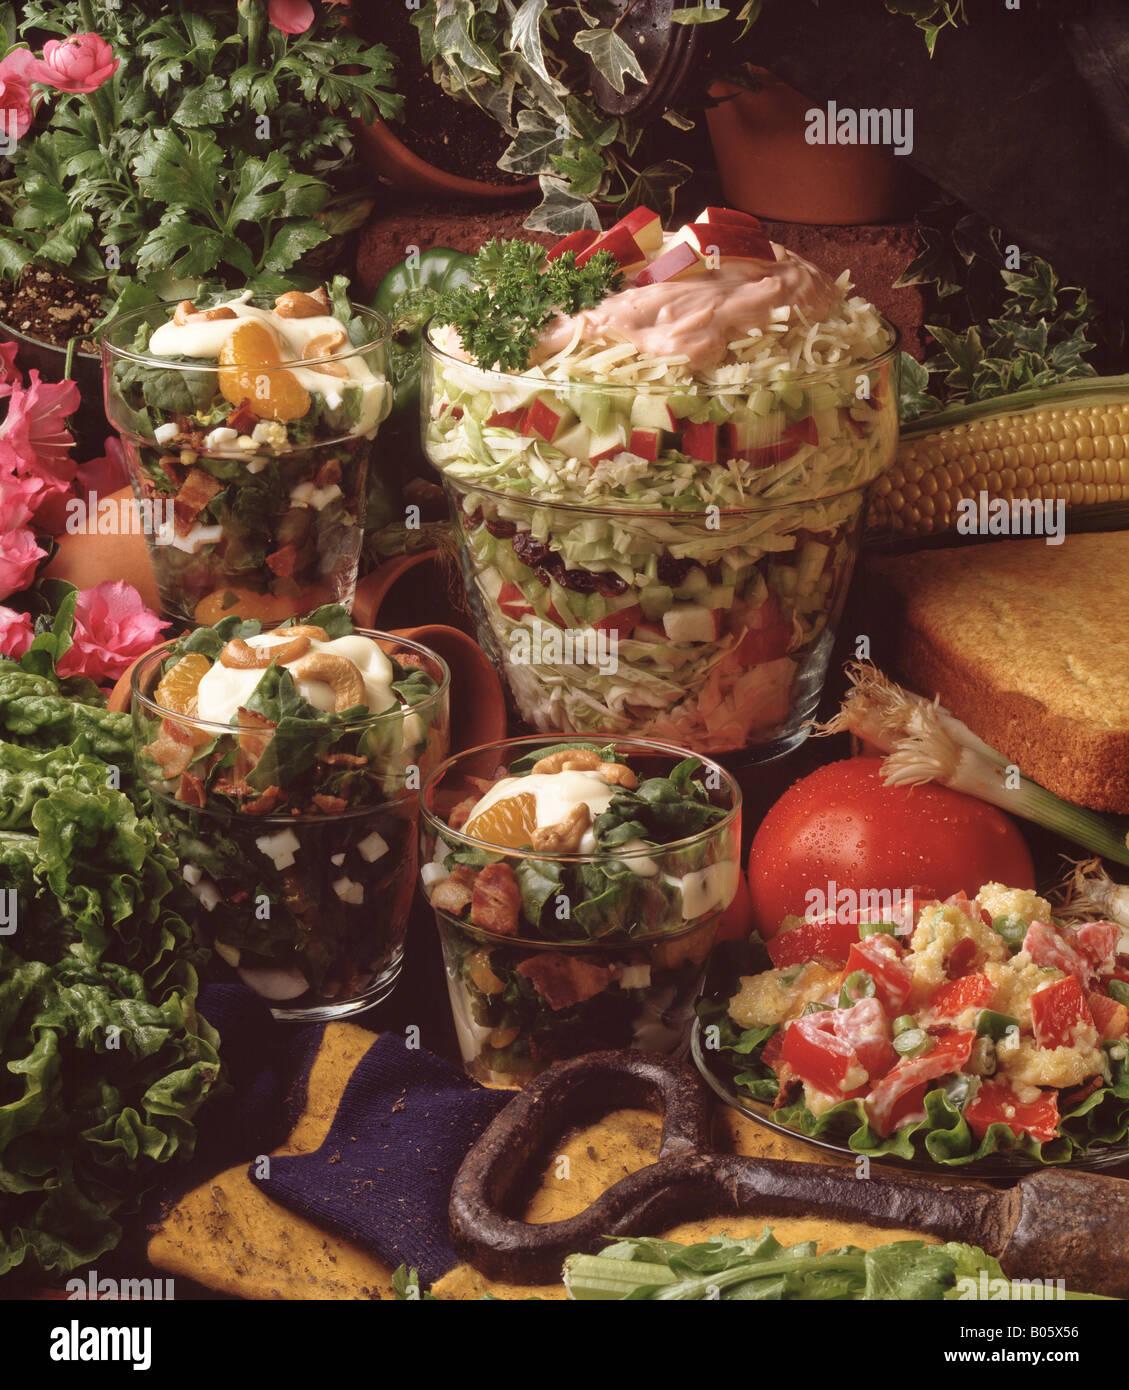 Country Kitchen Recipes Layered Slaw Spinach Salad Cornbread Summer Festive Spread Picnic